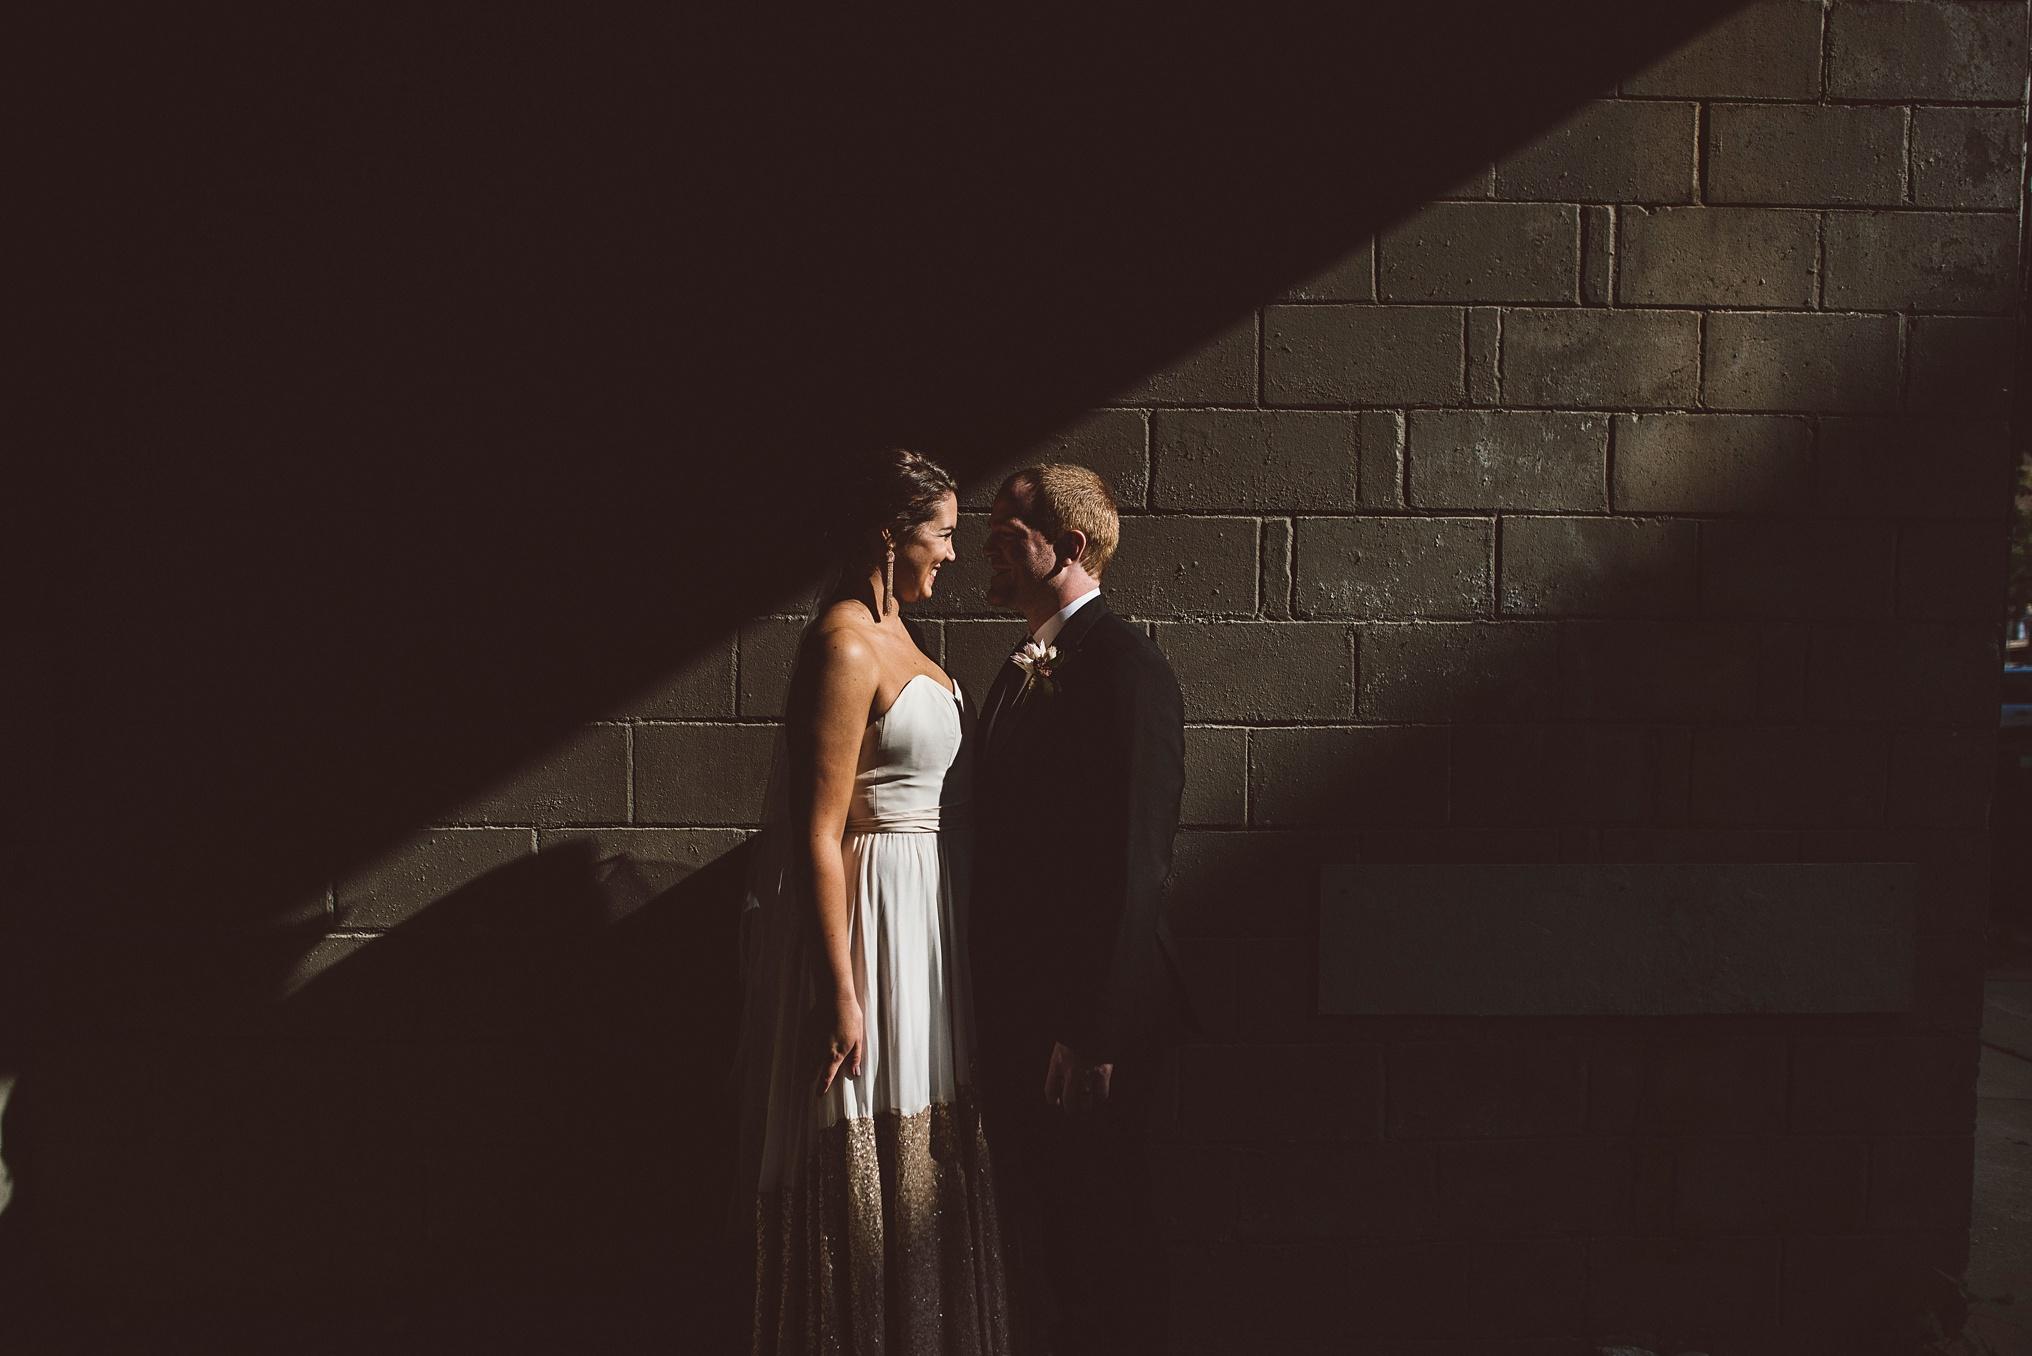 best_wedding_photography_2017_by_lucas_botz_photography_026.jpg